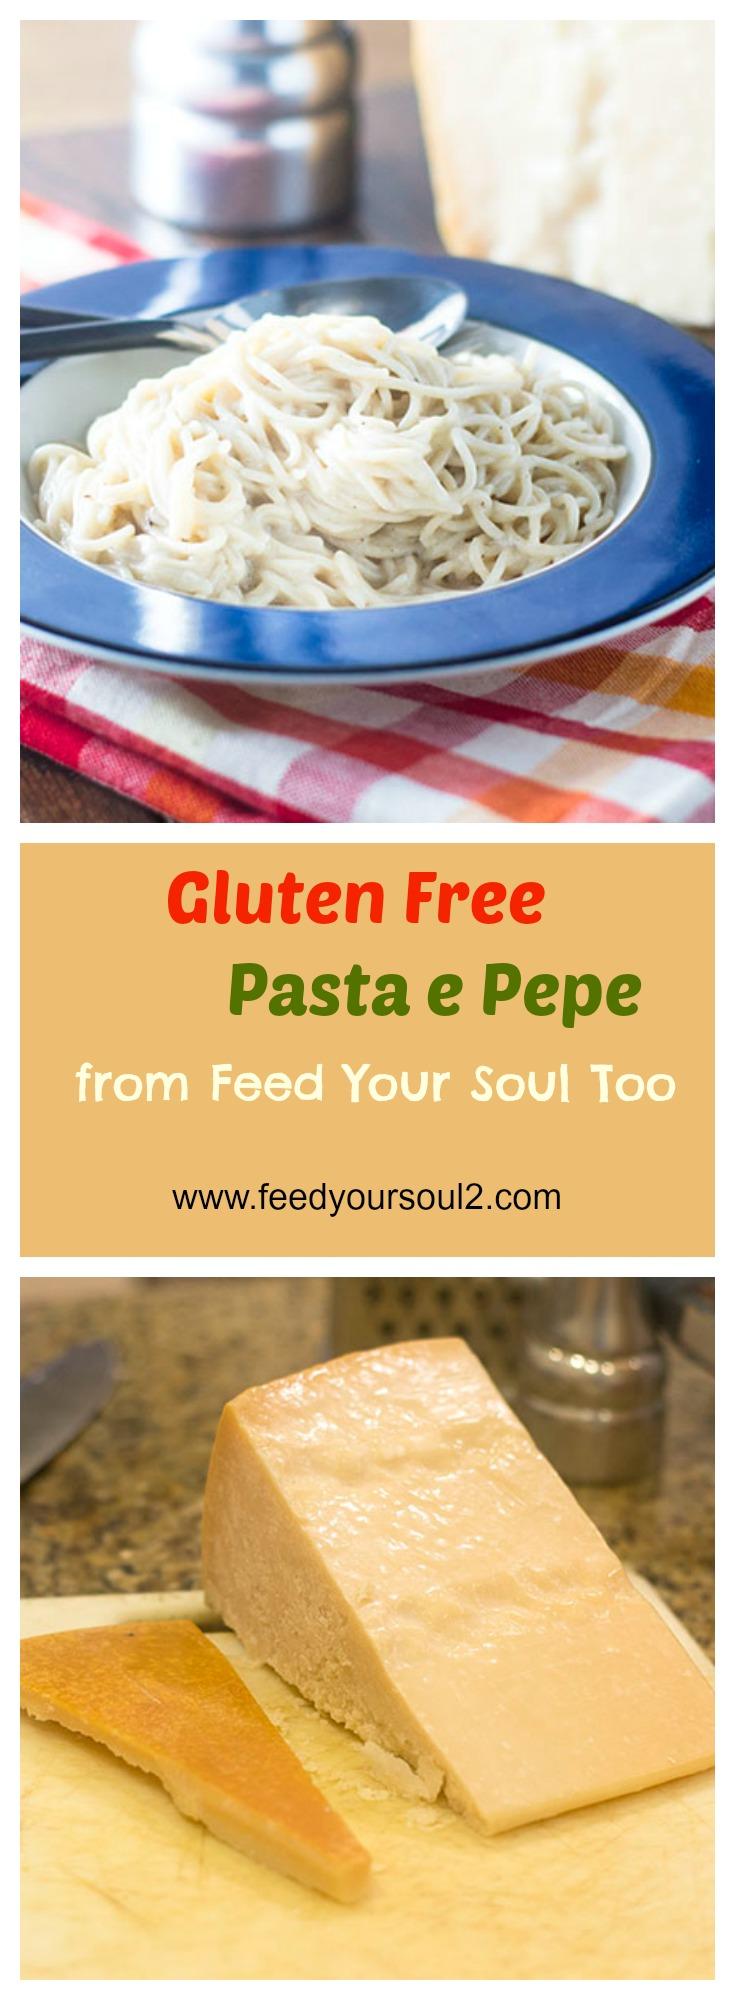 Gluten Free Pasta e Pepe #Italianfood #glutenfree #pasta #cheese| feedyoursoul2.com